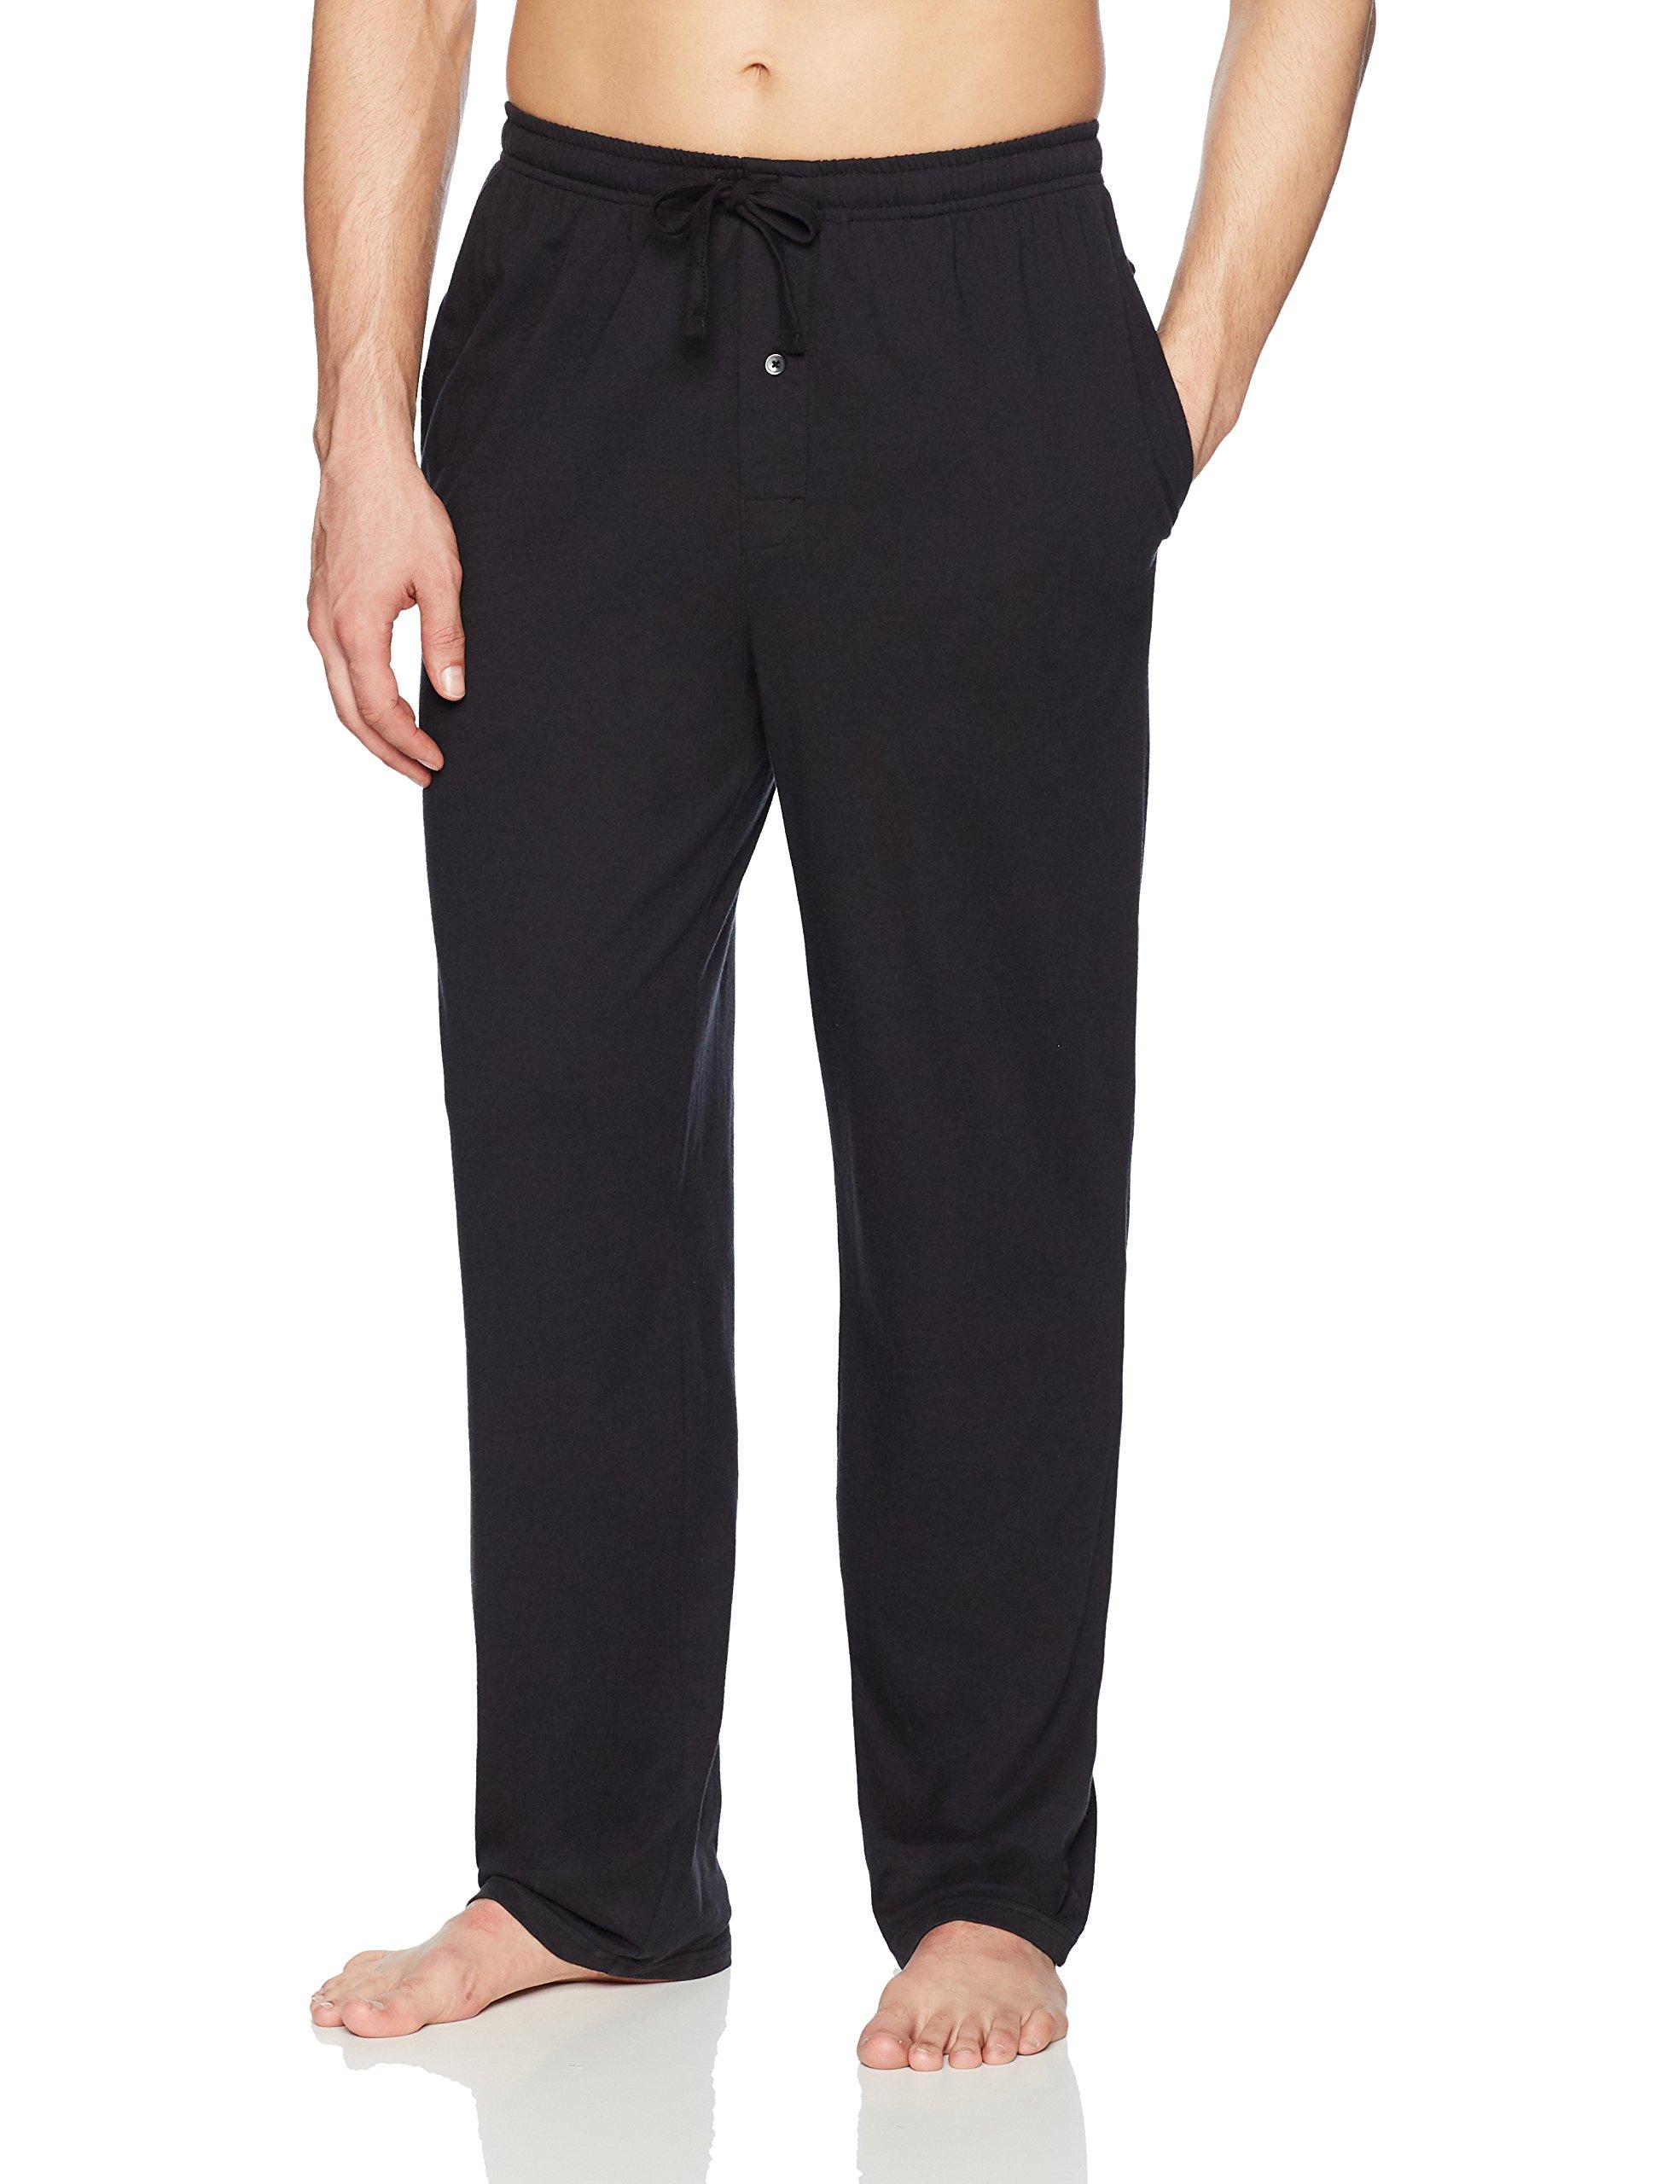 Amazon Essentials Men's Knit Pajama Pant, Black, Large by Amazon Essentials